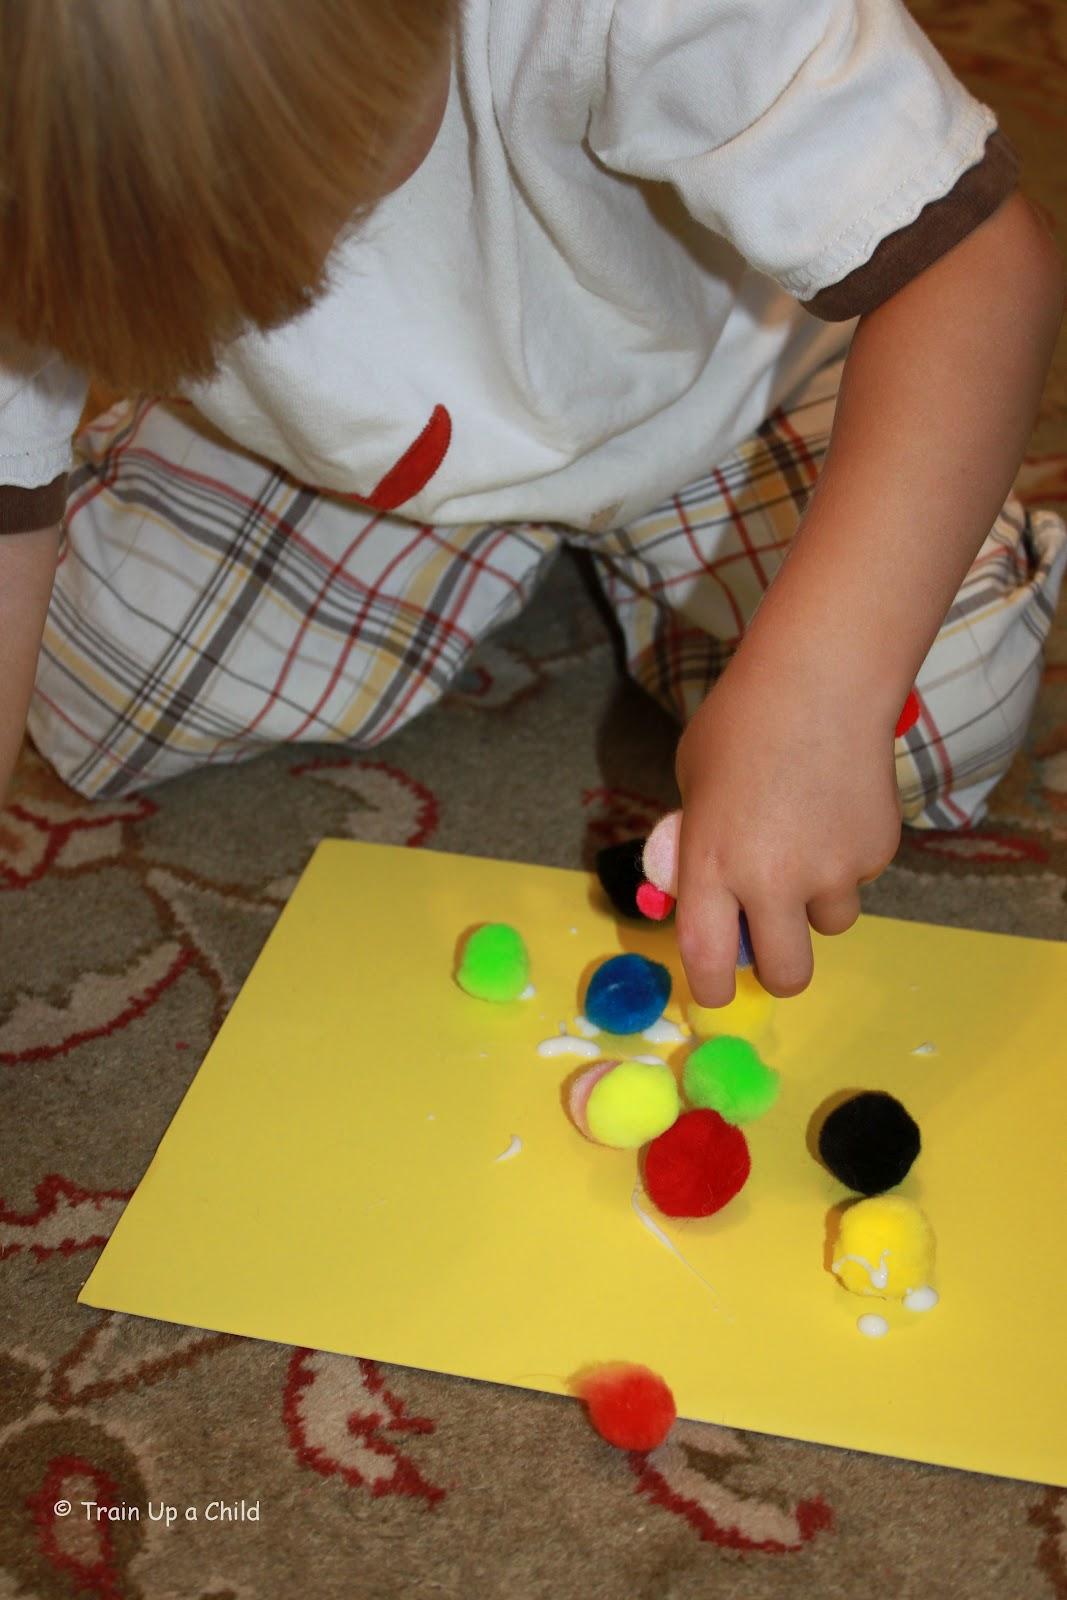 http://2.bp.blogspot.com/-sxjdUhuu3Jw/UEaEC2vHLVI/AAAAAAAAKX8/4yYvlq_d4vk/s1600/Apple+crafts+and+learning+unit+for+preschool+(9).jpg